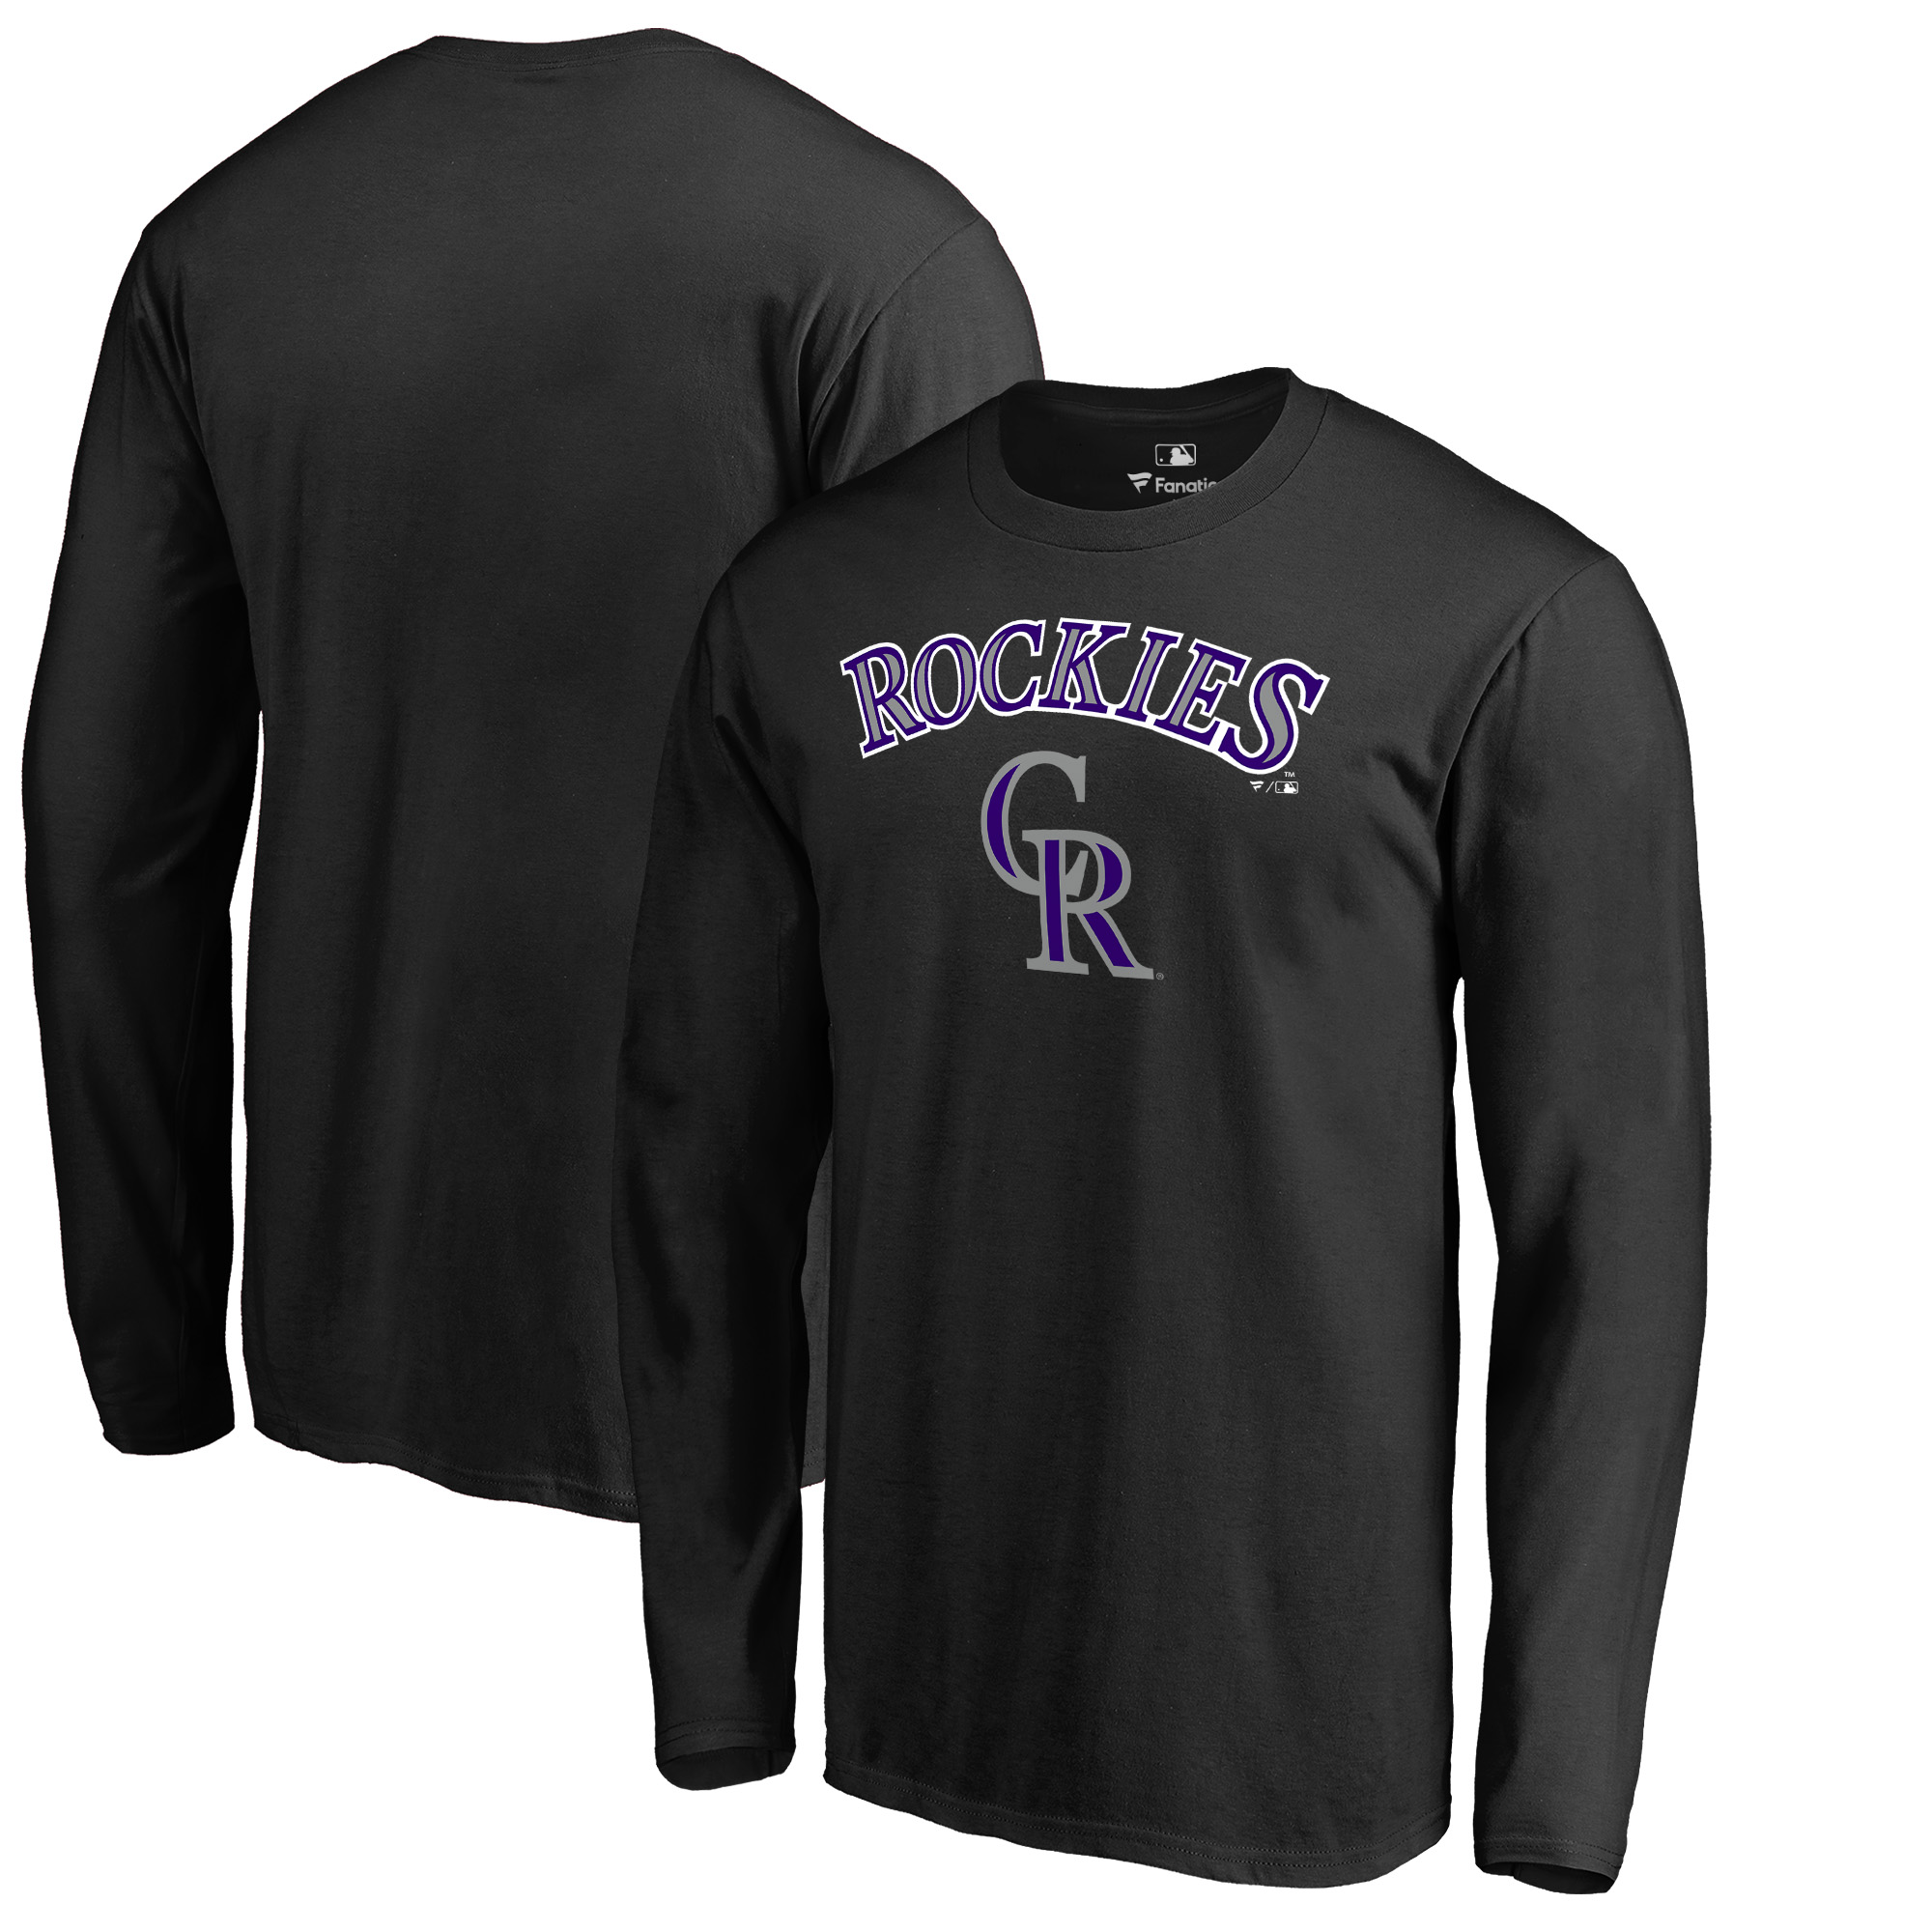 Colorado Rockies Fanatics Branded Team Lockup Long Sleeve T-Shirt - Black